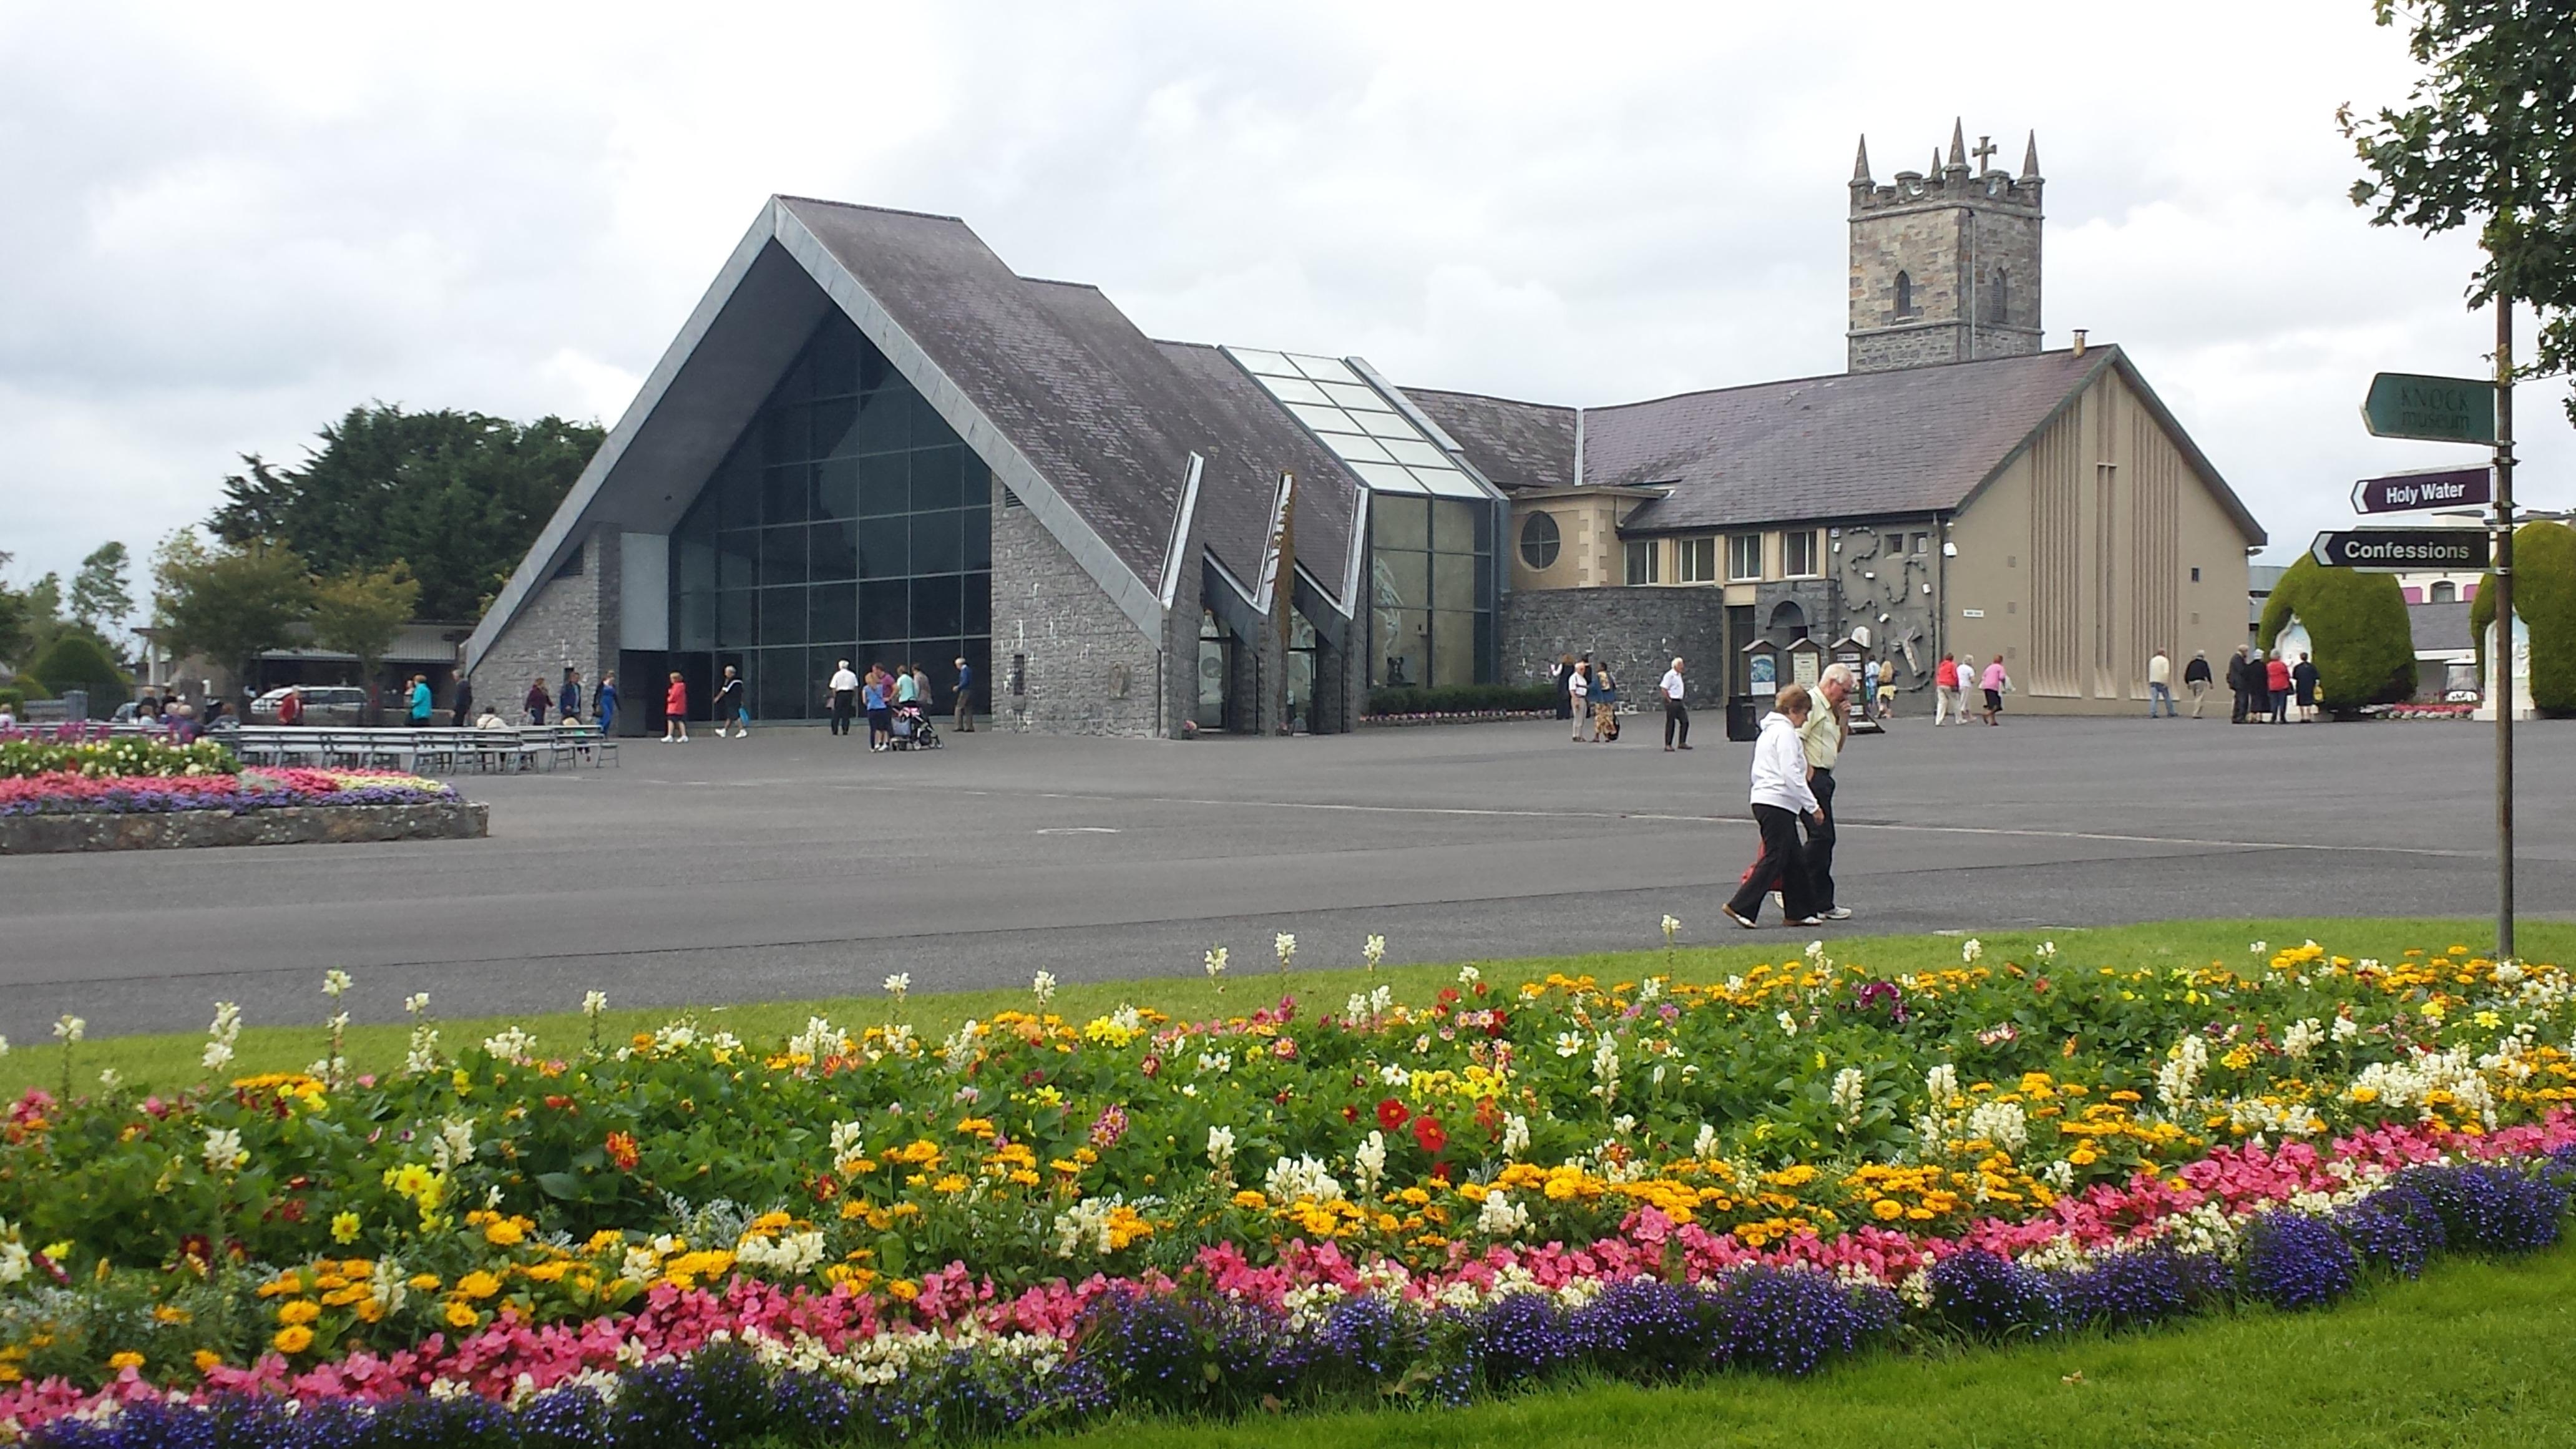 Ordinaire Plant Lawn Flower Park Garden Tourism Memorial Ireland Pilgrimage Mayo Knock